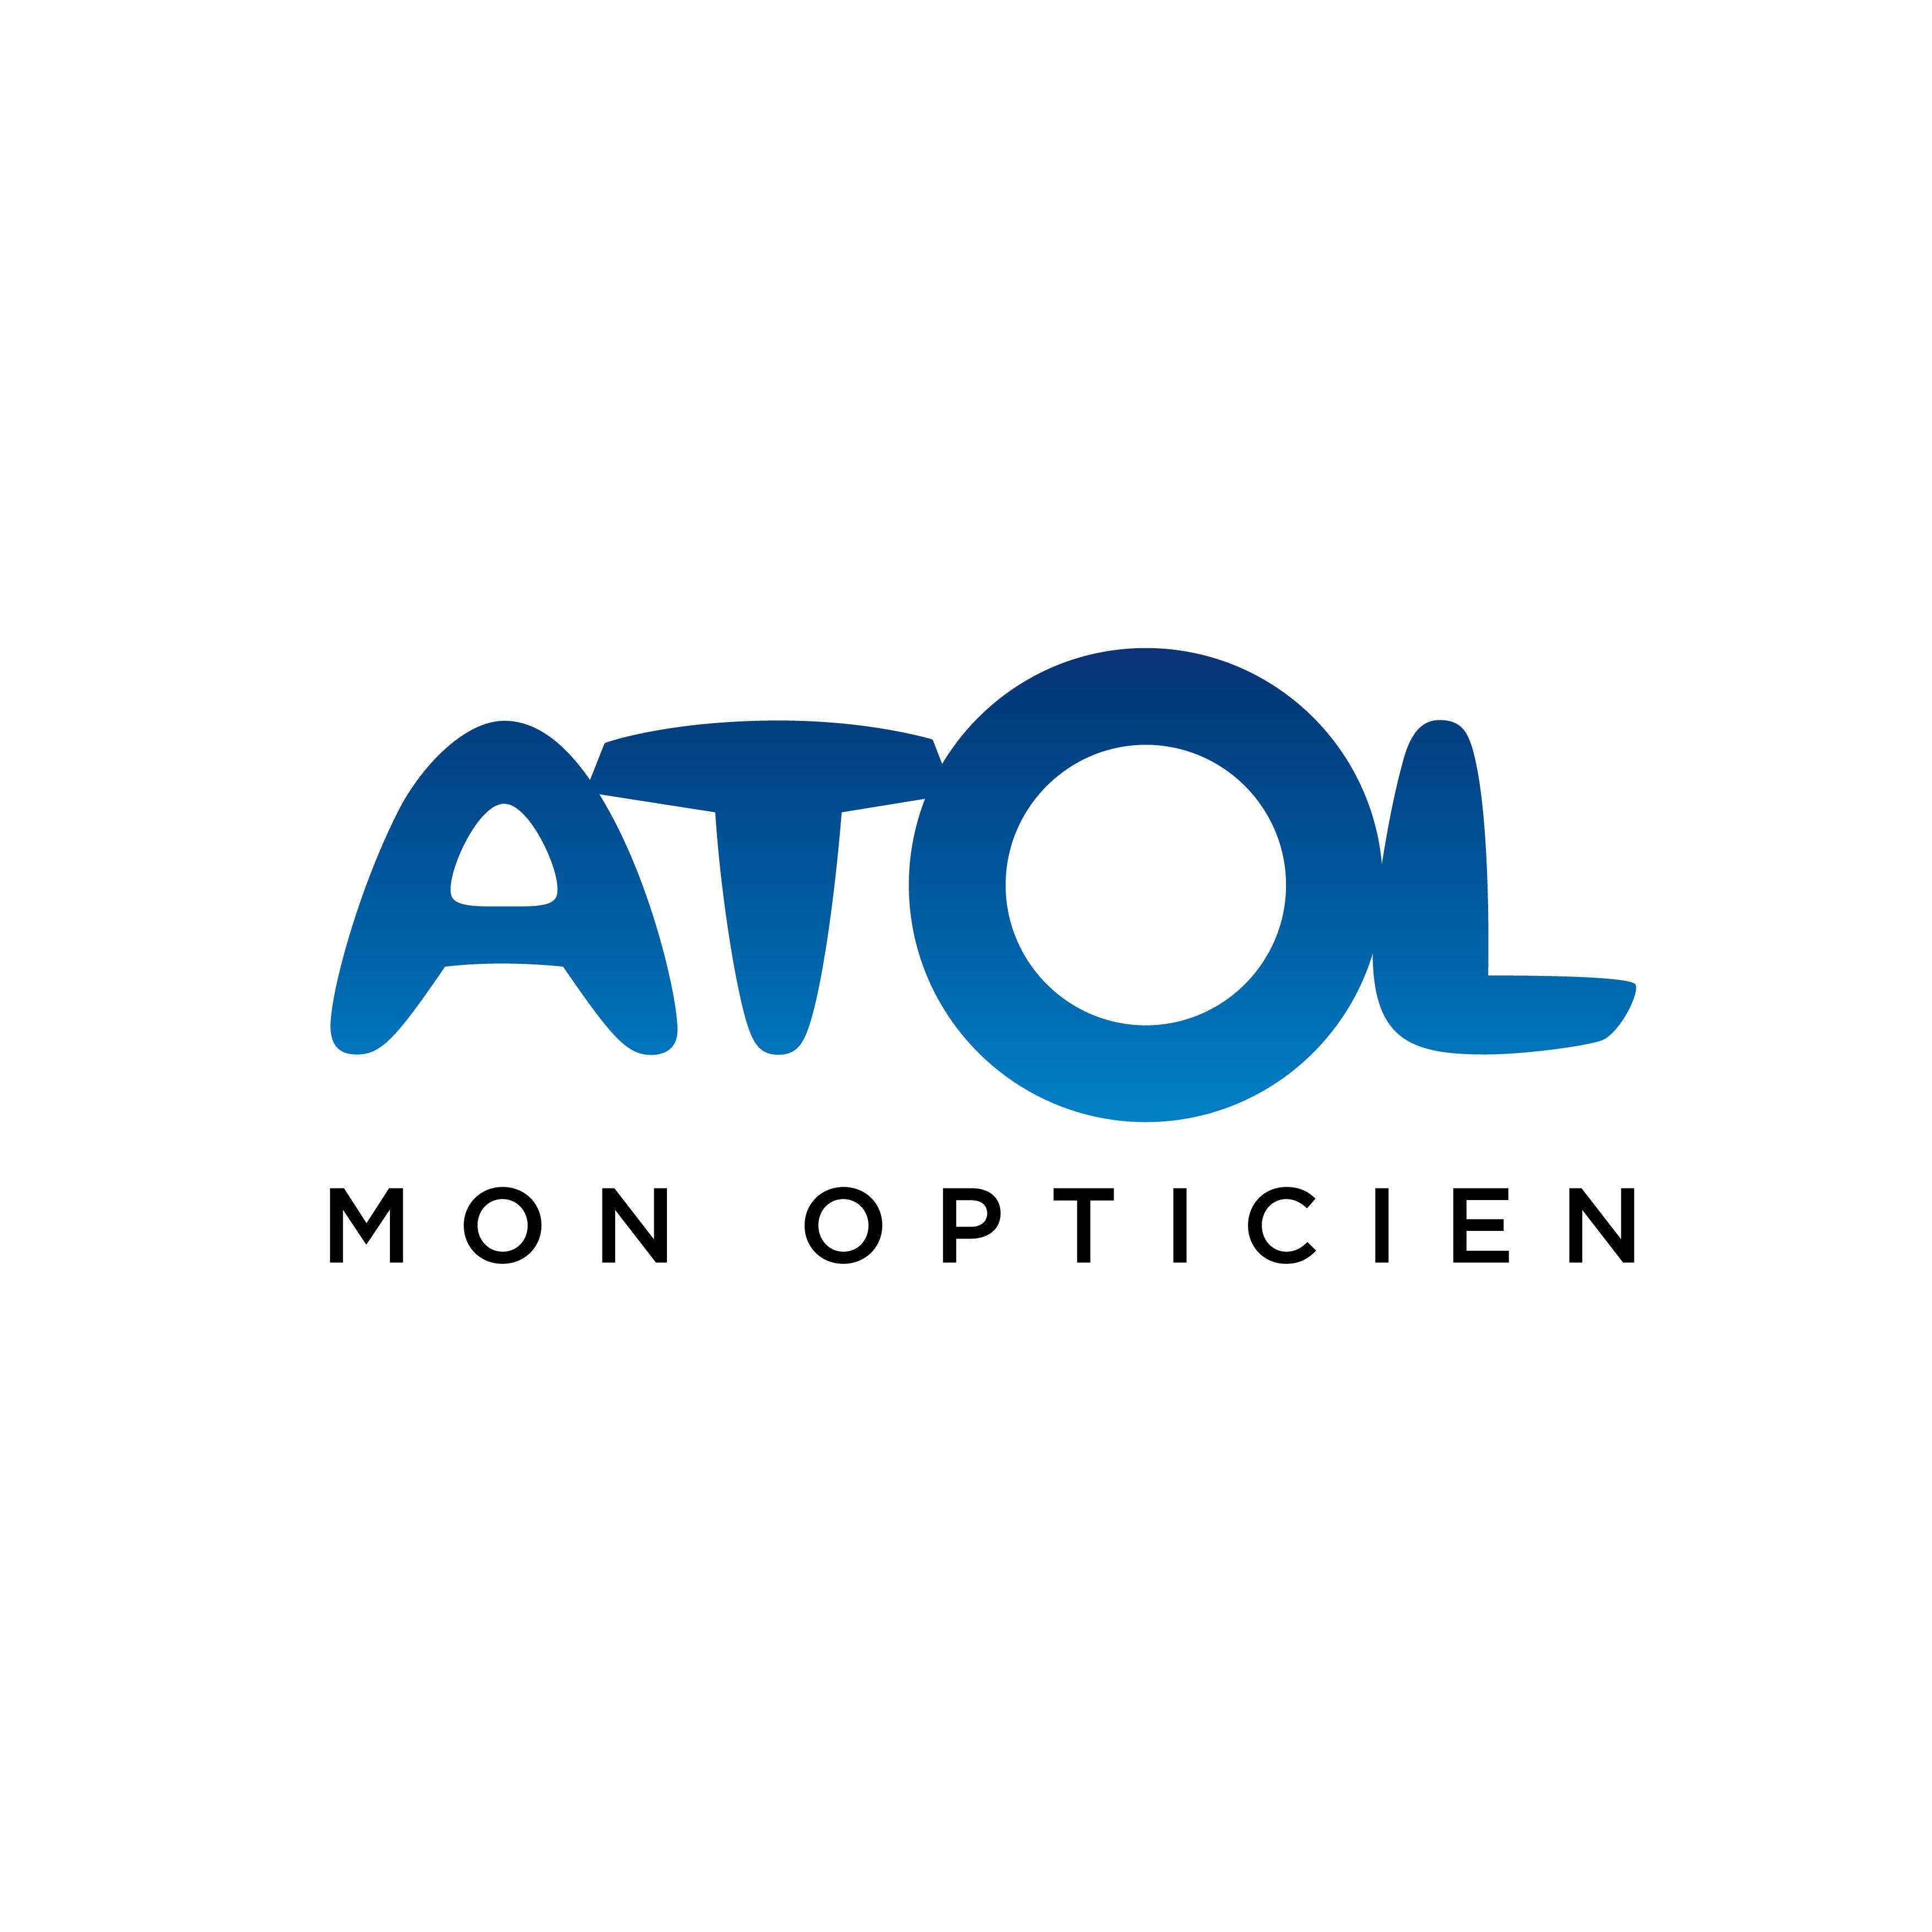 Atol Mon Opticien